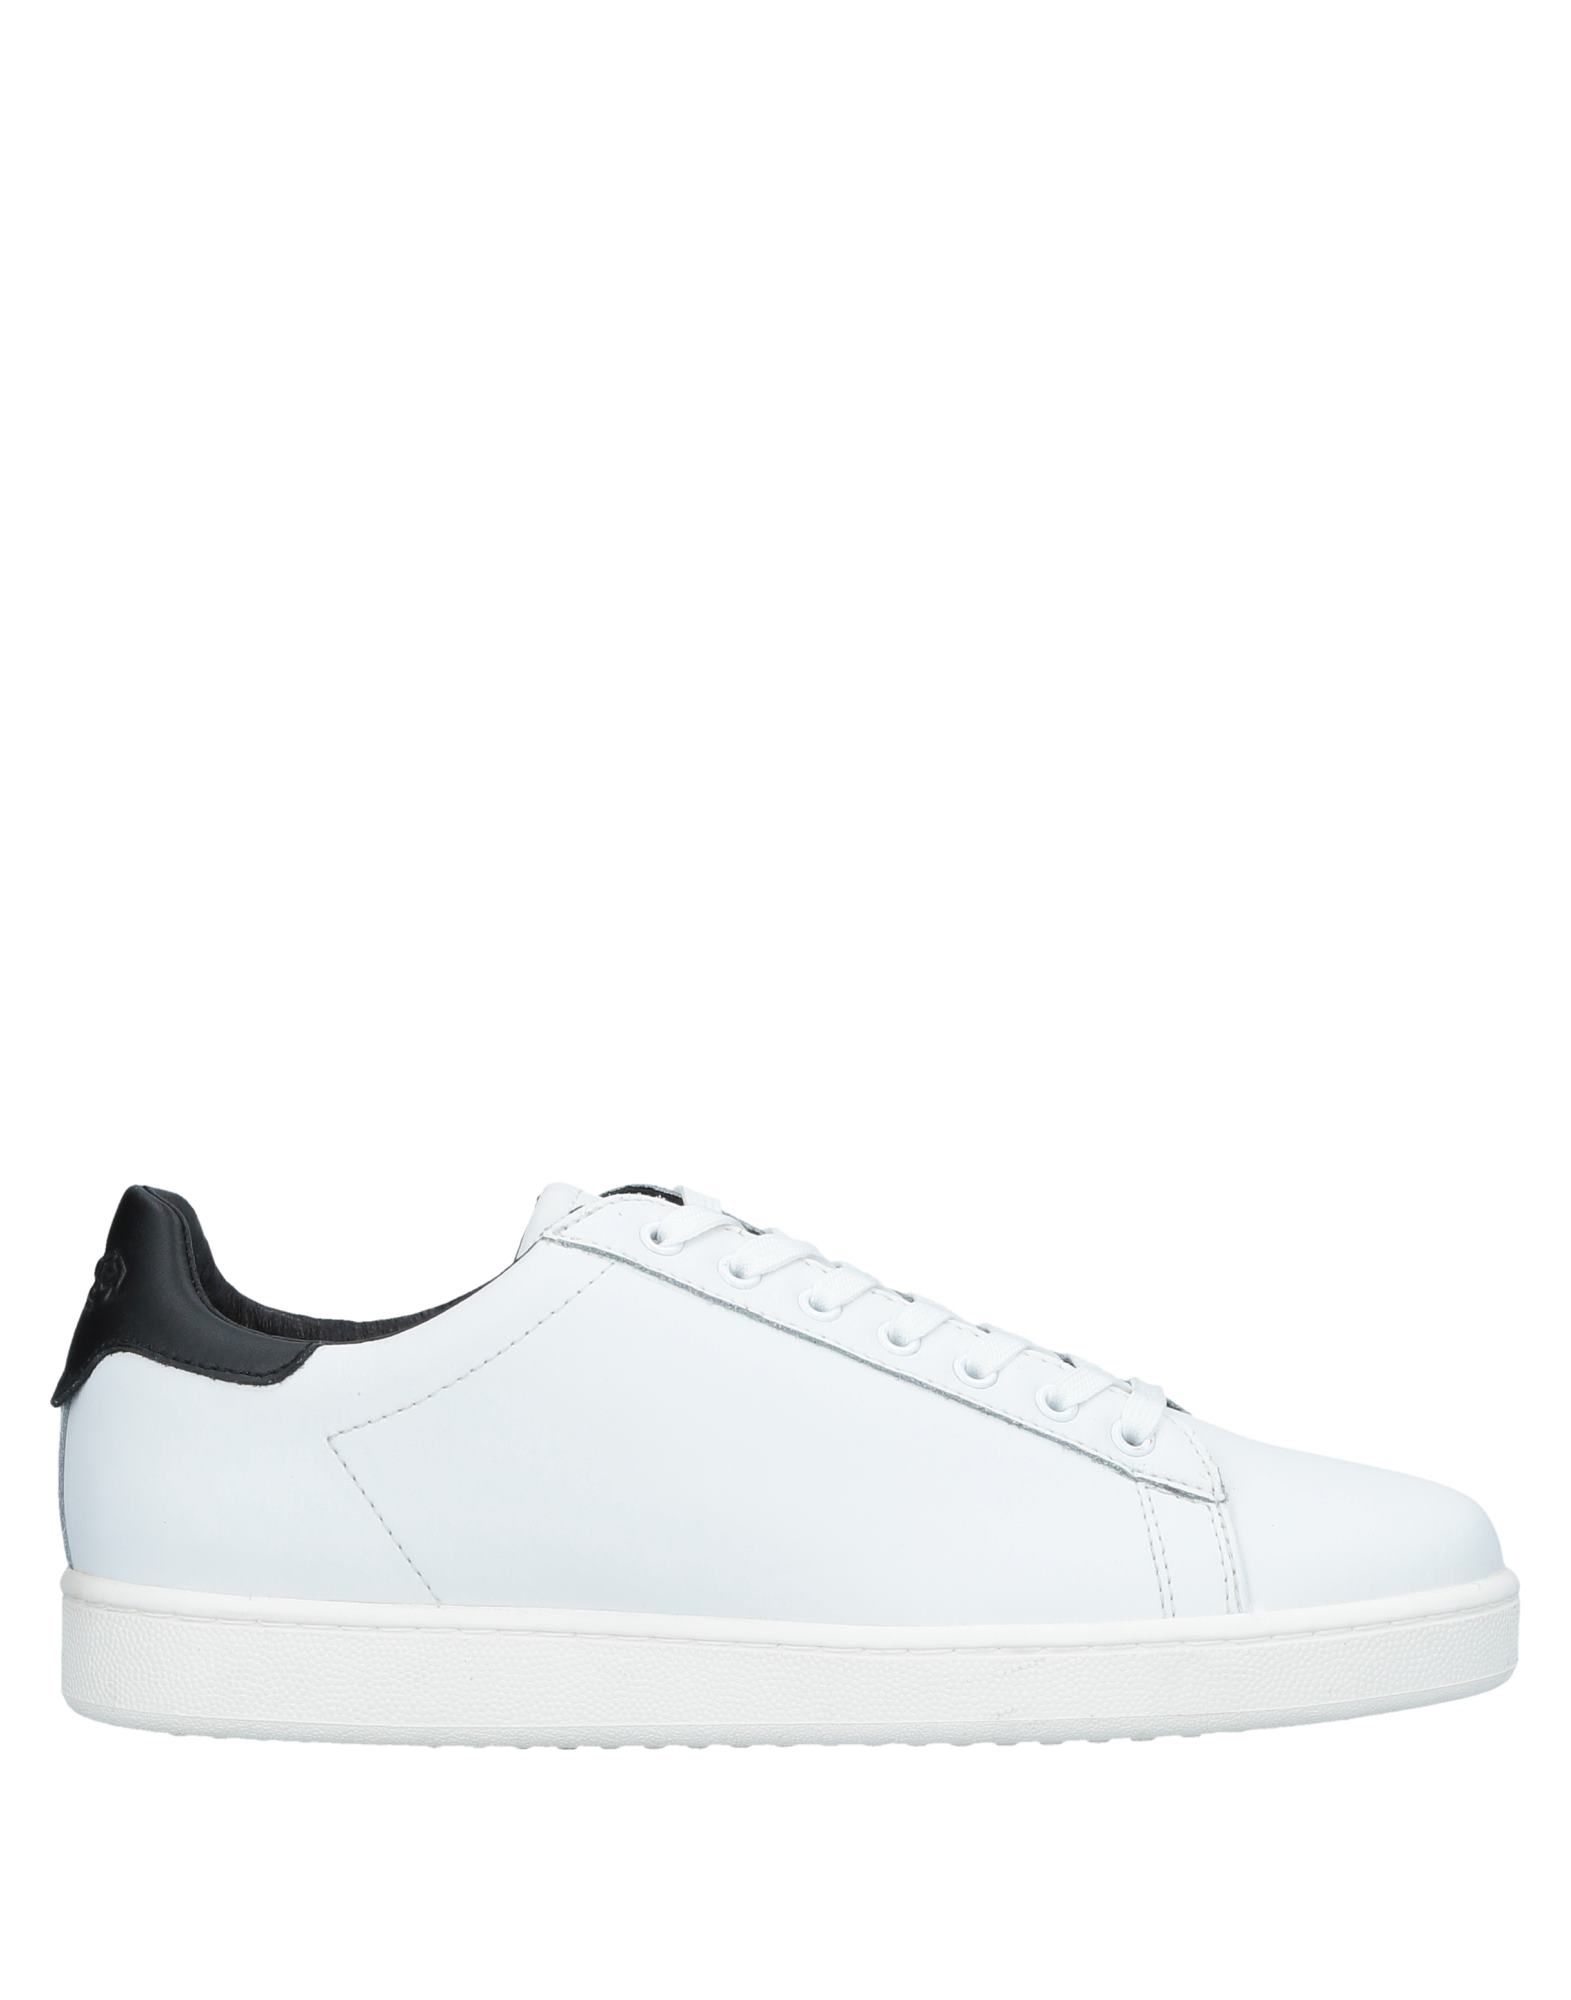 Sneakers Moa Master Of Arts Uomo - 11532146XW